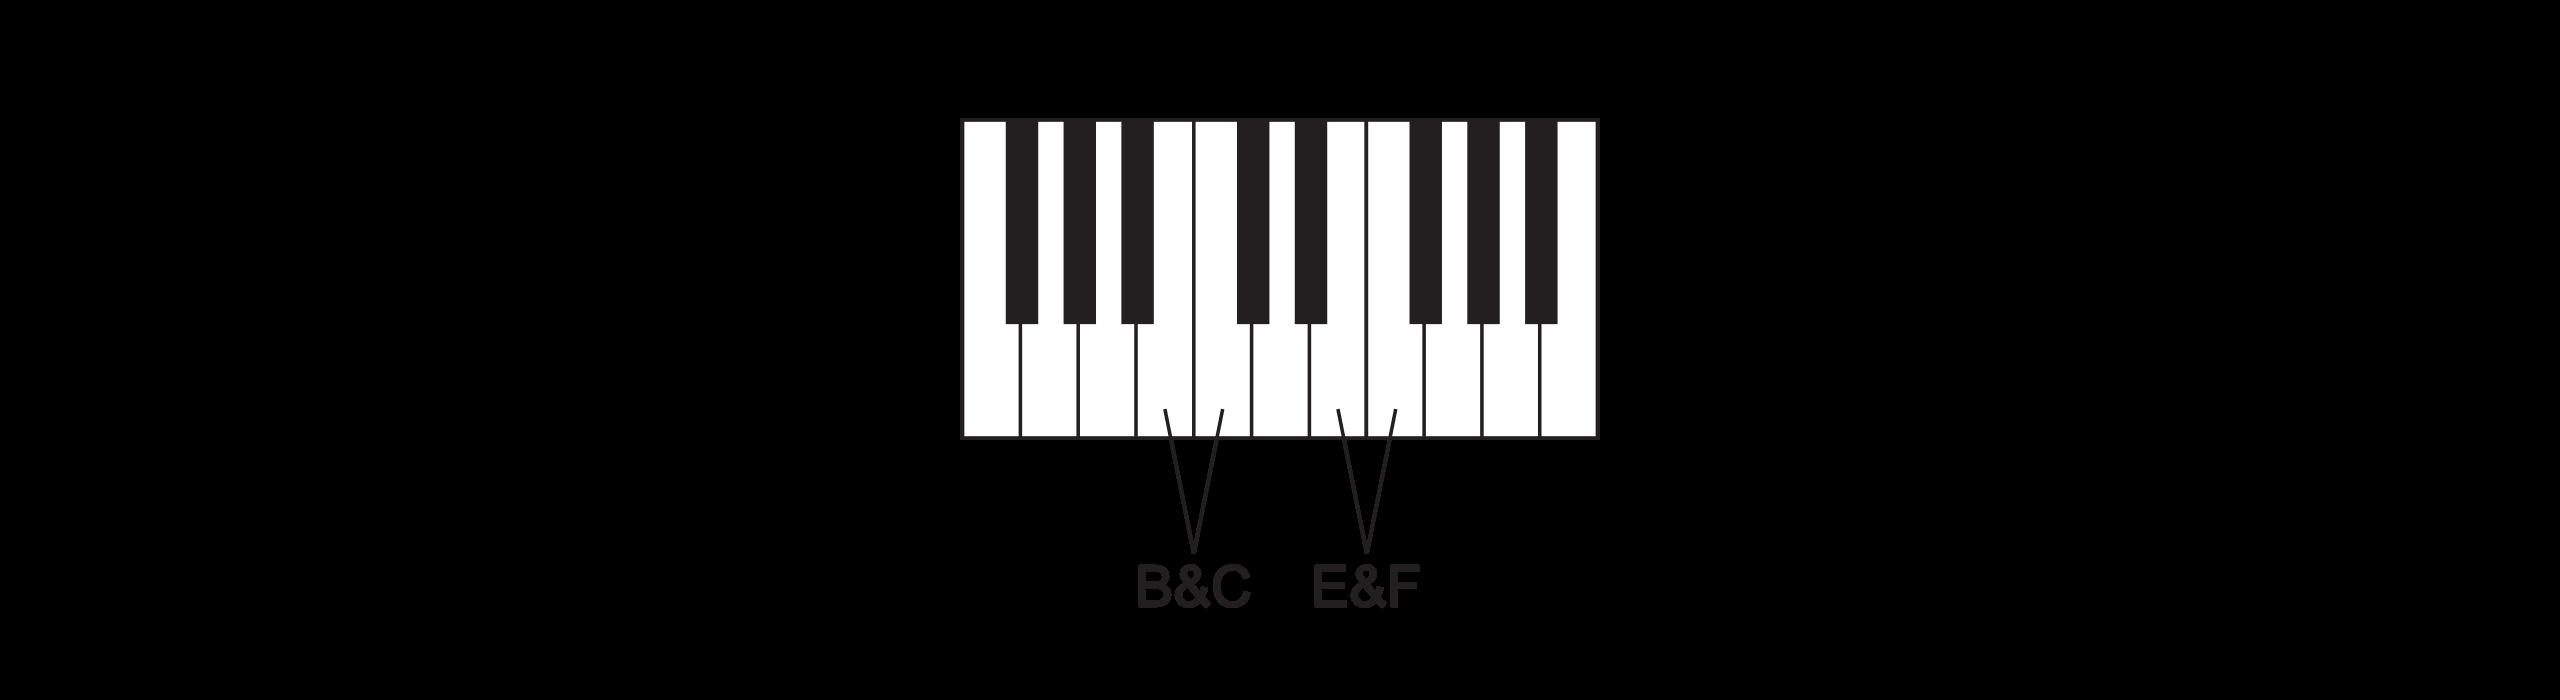 Piano BC & EF Rule